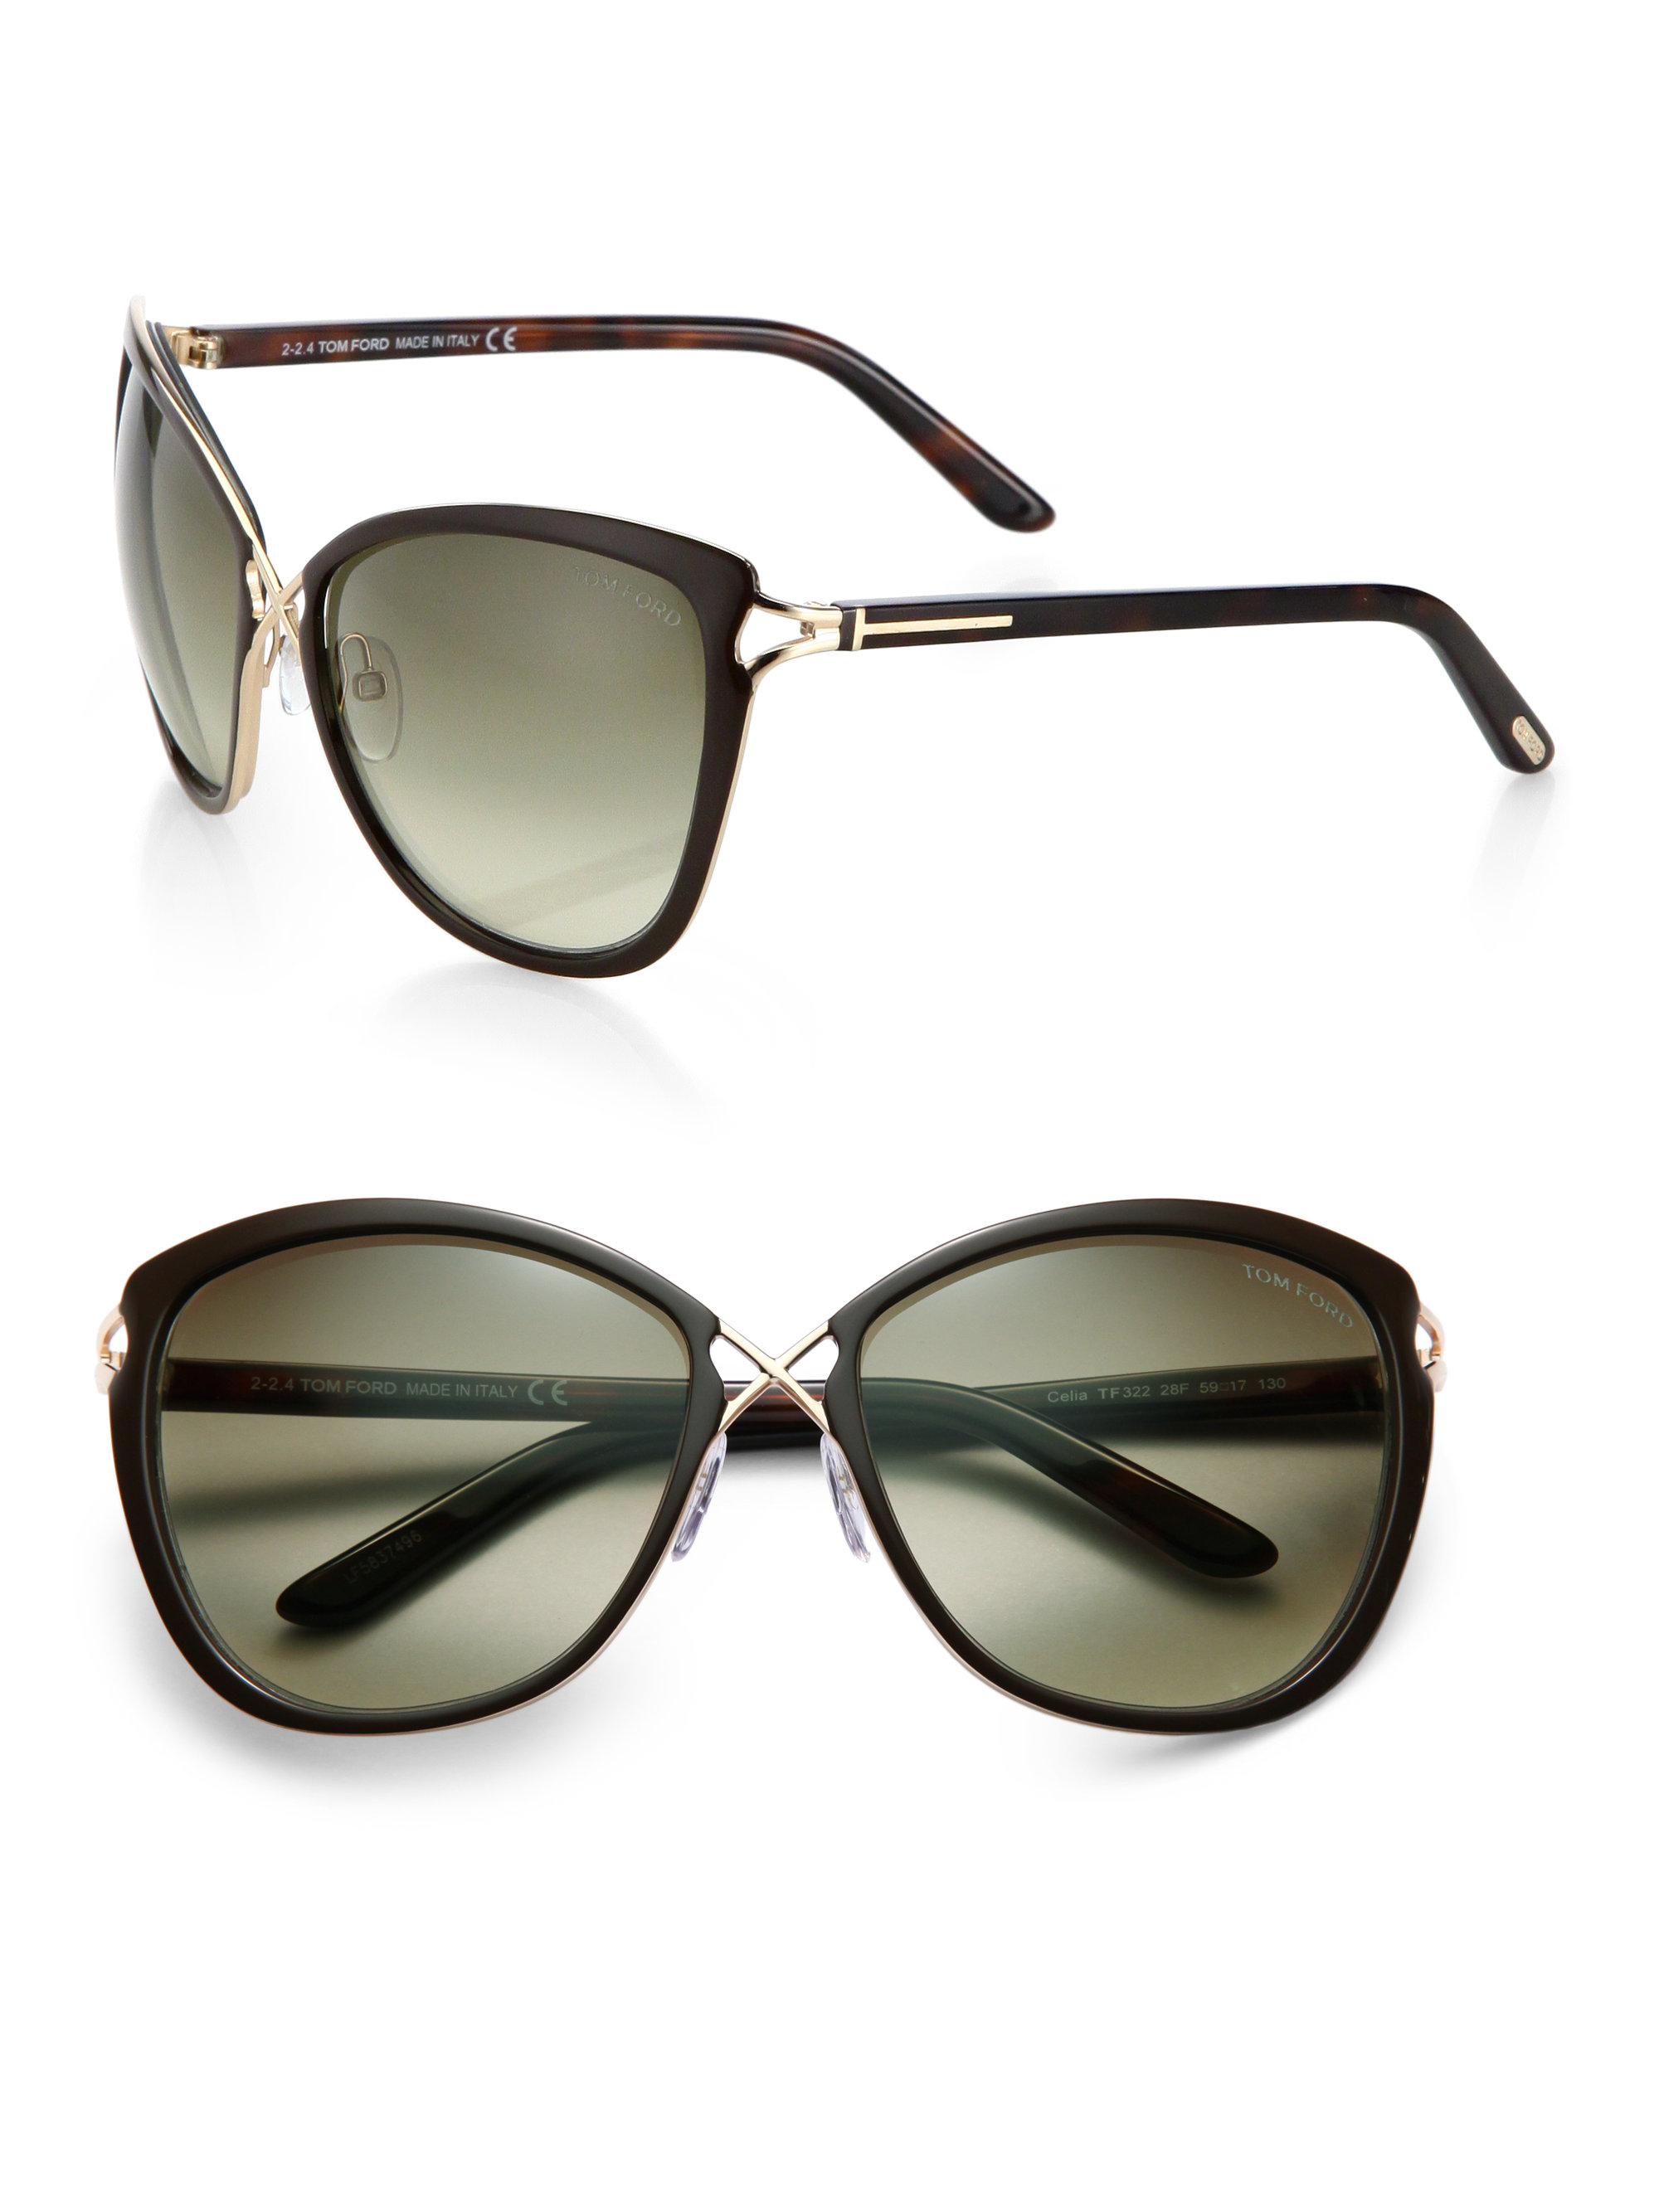 06c5561afac Tom ford Criss-cross 59mm Butterfly Sunglasses in Black for Men